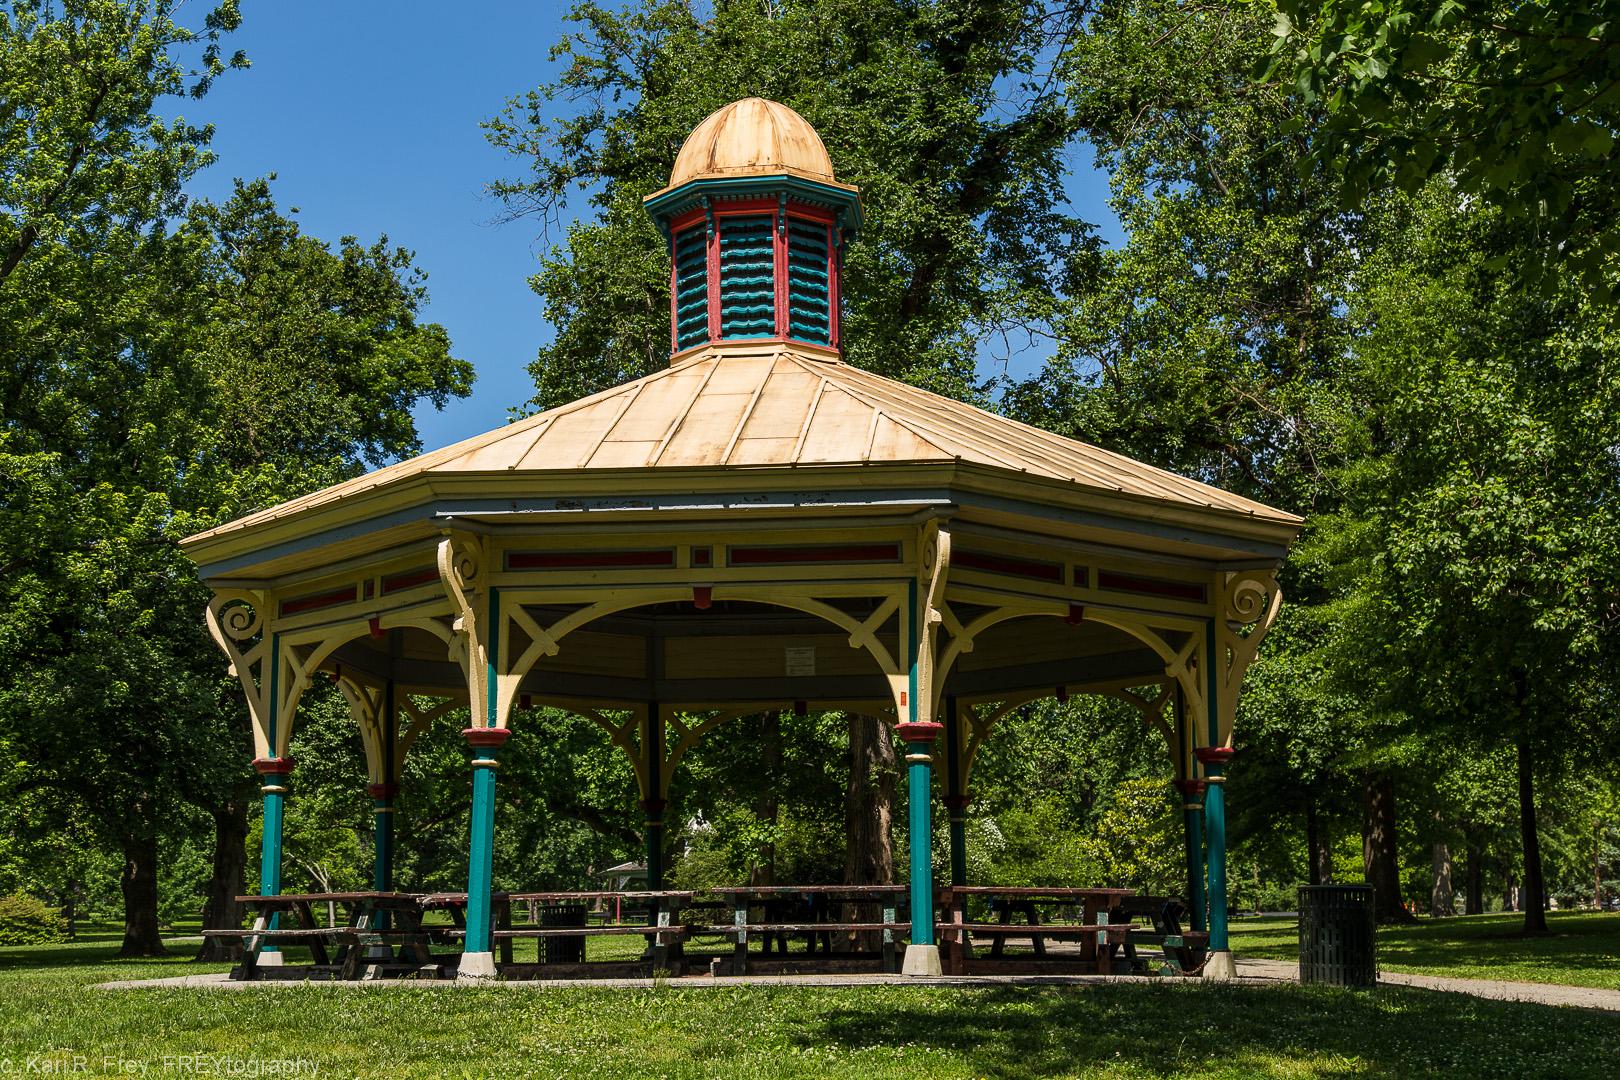 Humboldt South Pavilion